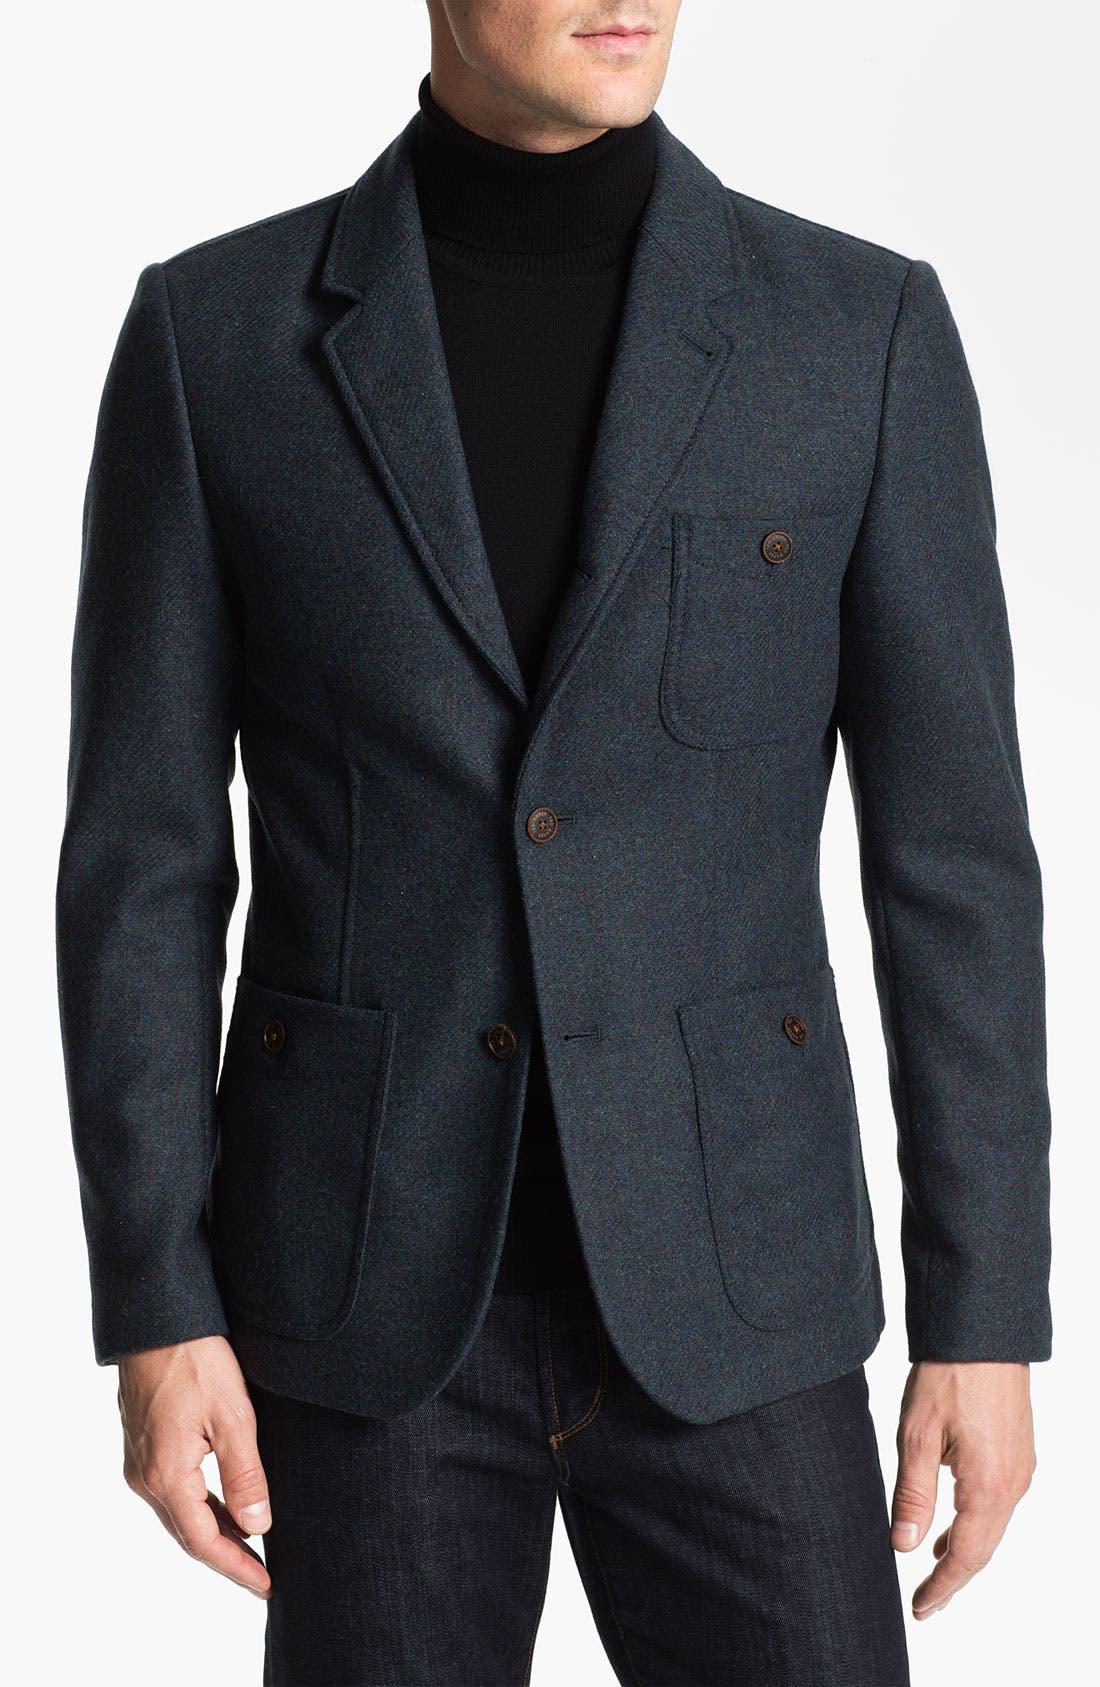 Alternate Image 1 Selected - Ted Baker London 'Moosh' Wool Blazer